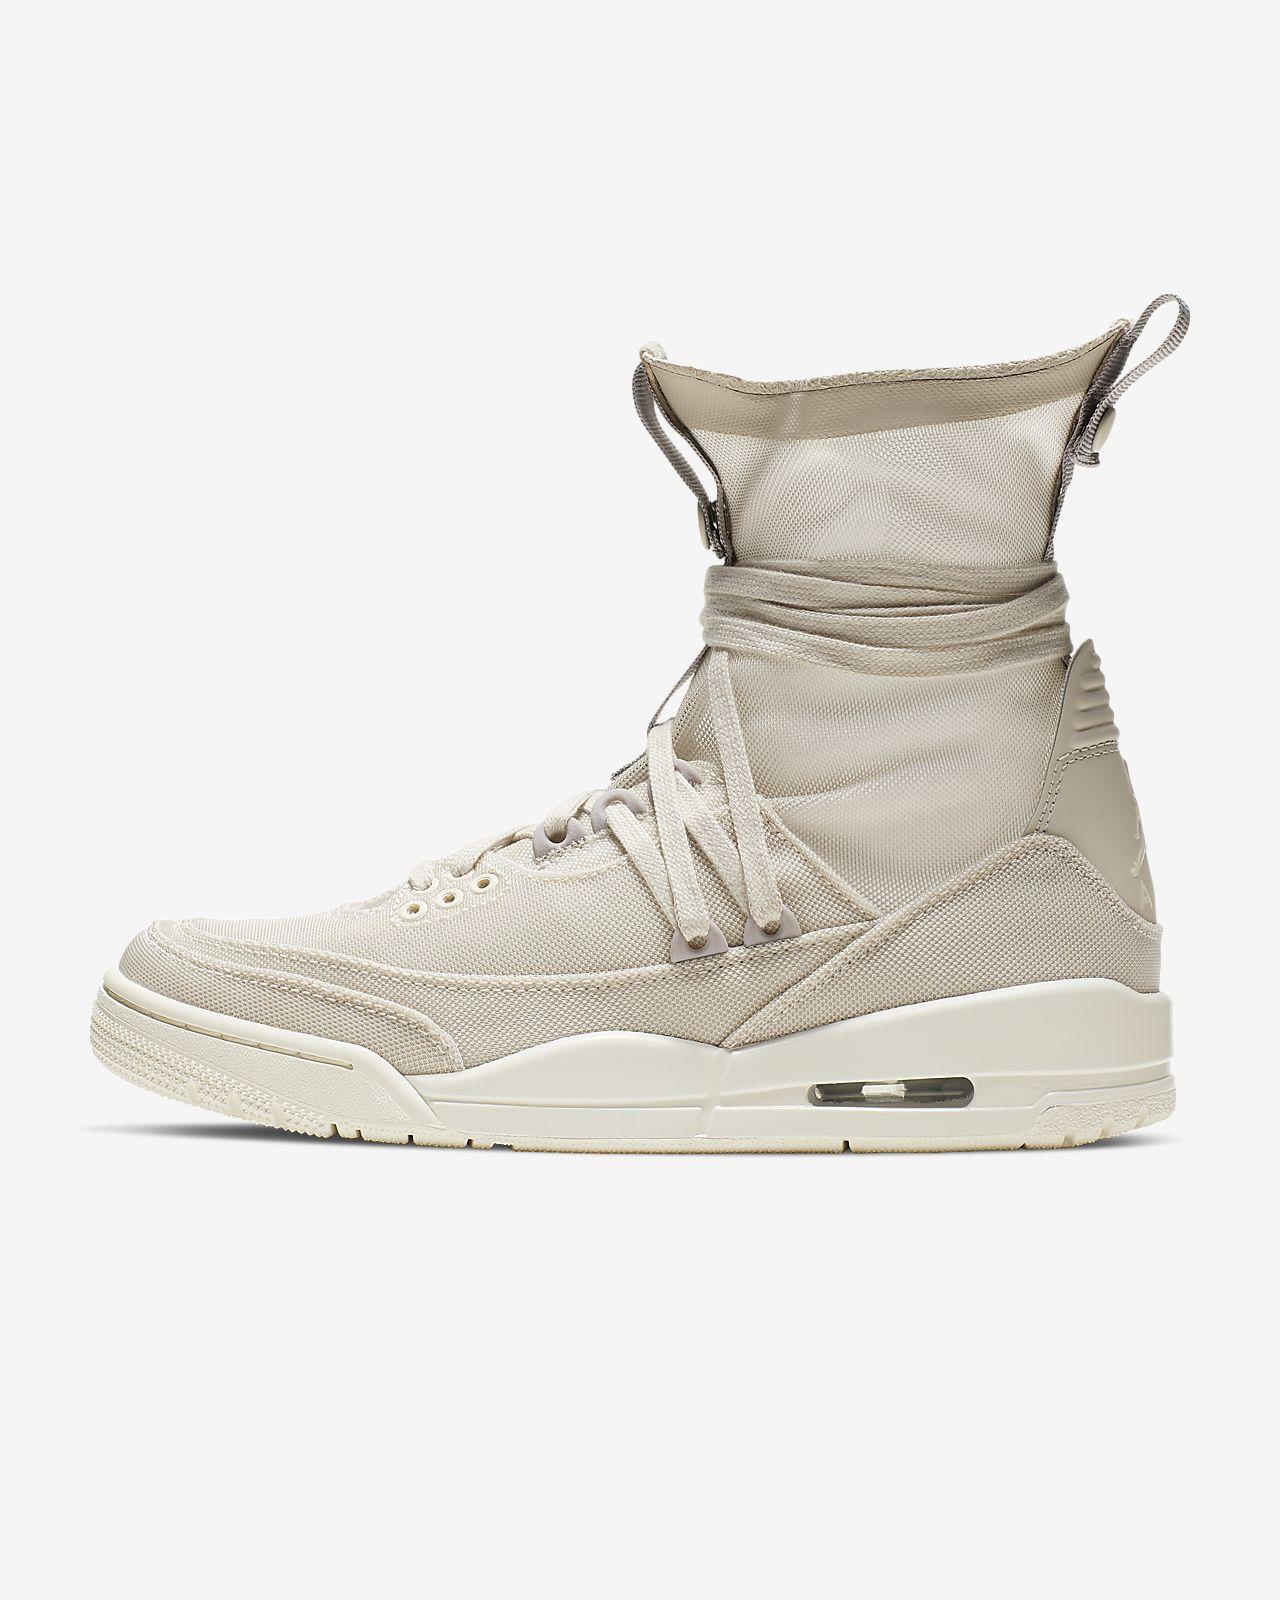 Air Jordan 3 RTR EXP Lite XX女子运动鞋